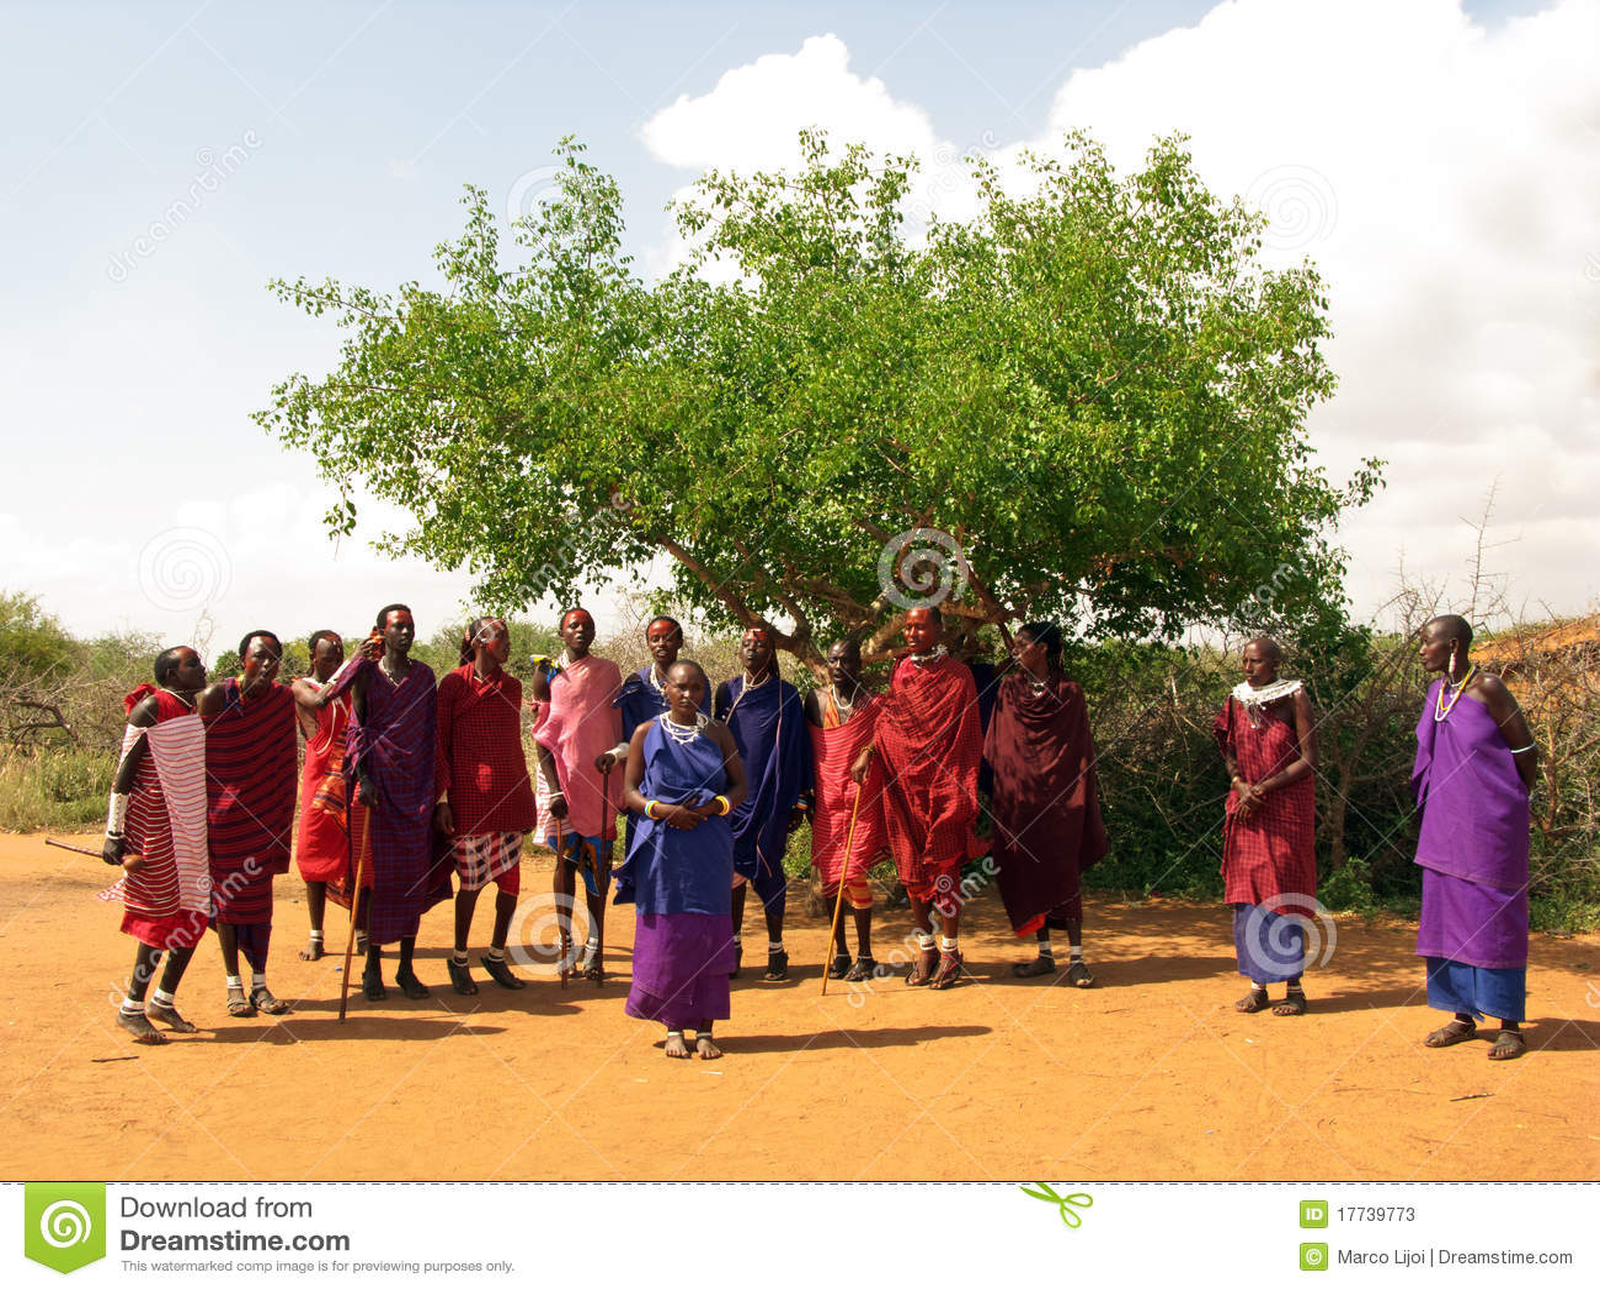 masai music The wake-masai bey,roc marciano,elucid,l'wren,junclassic,marq spekt,willie green,billy woods,歌曲,歌词,在线试听,mp3下载, 免费 首页 榜单 歌手 歌手 其他歌手 0.